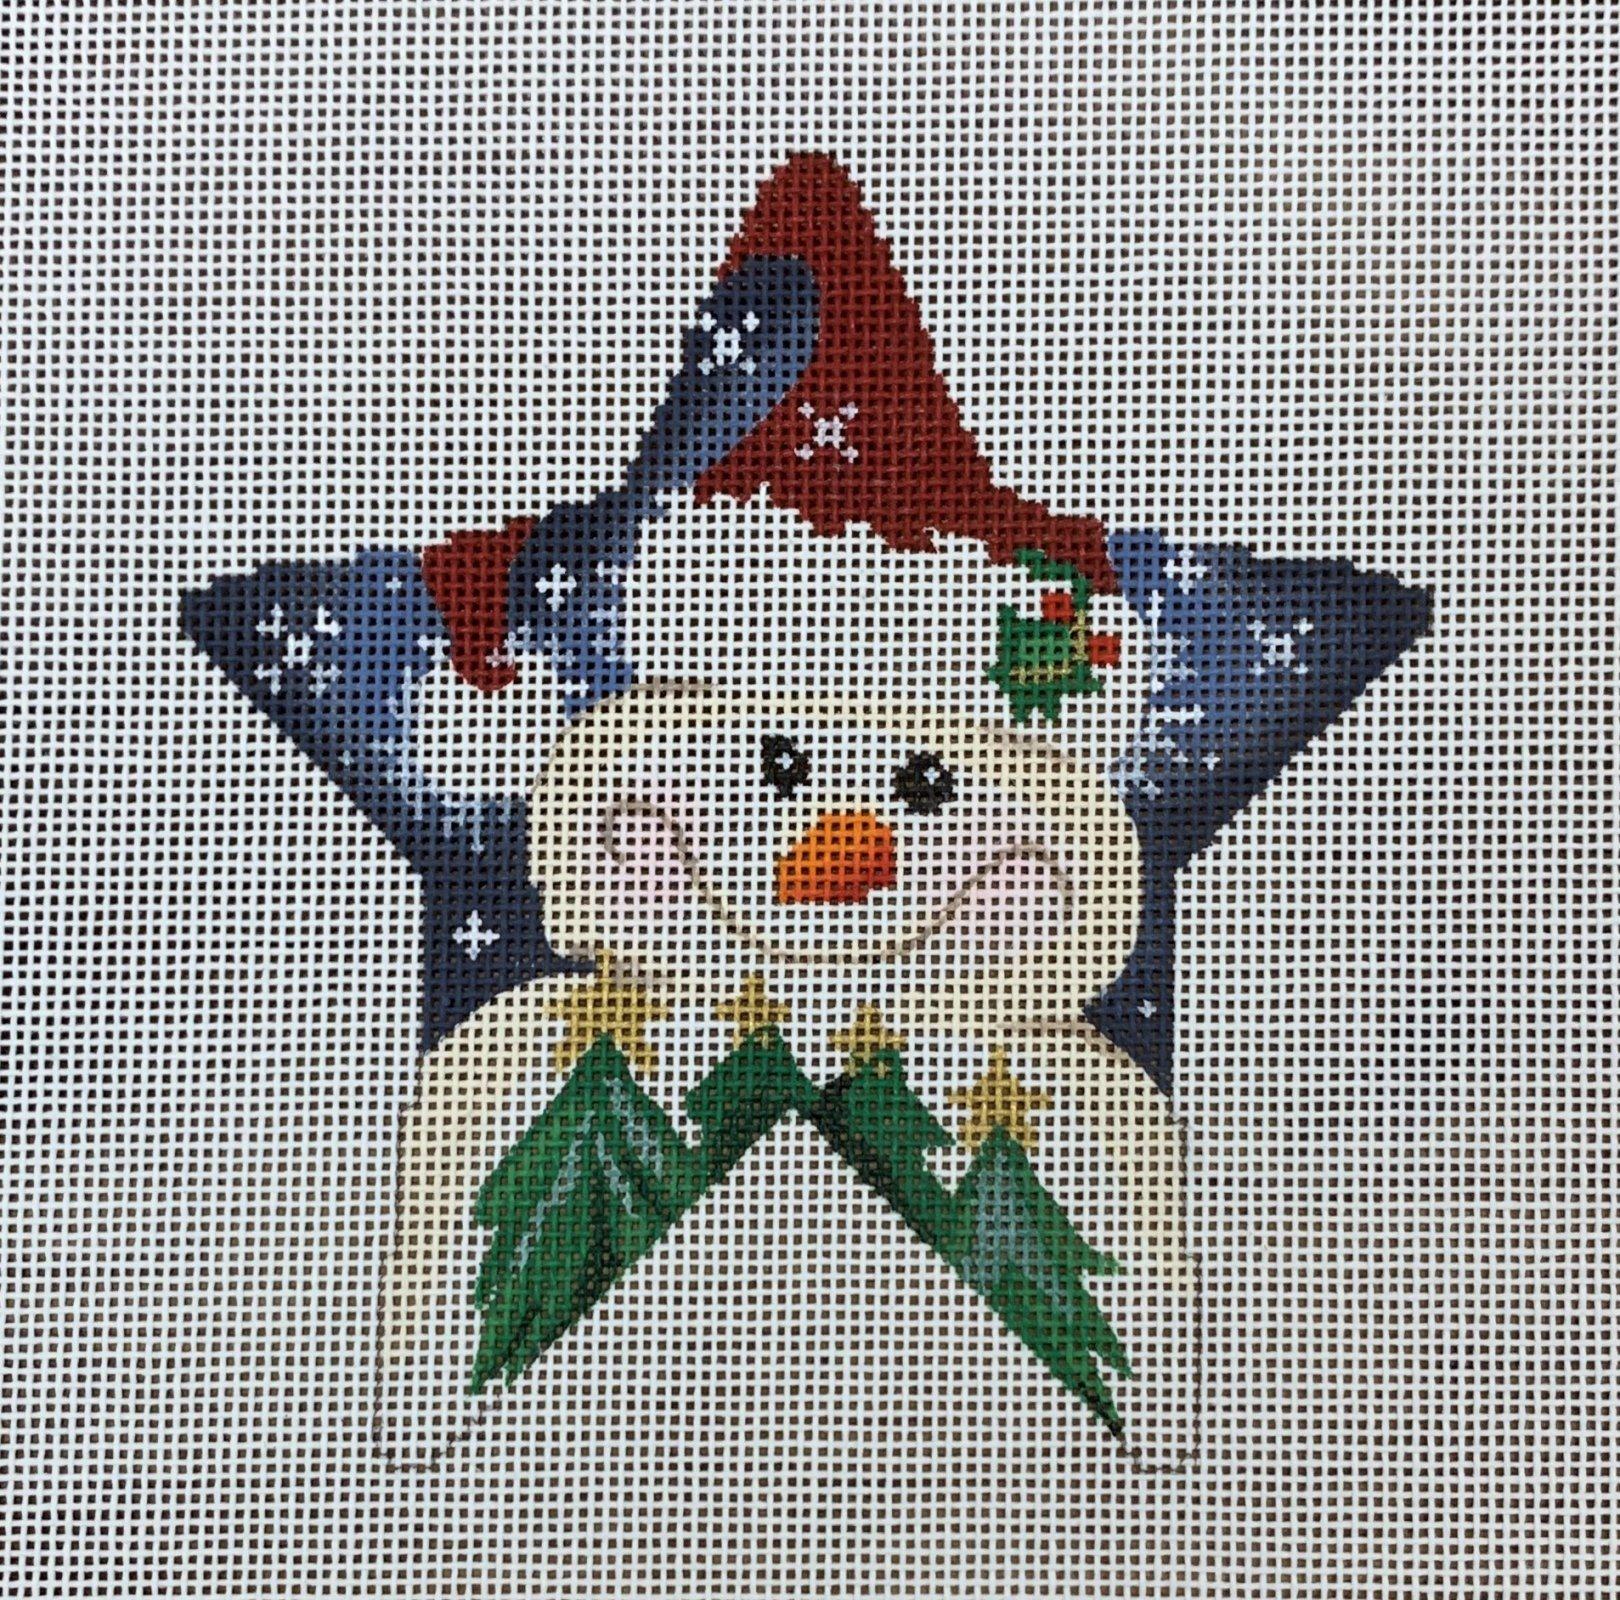 ATTSCT1704 Snowman Star  4.75x5  18